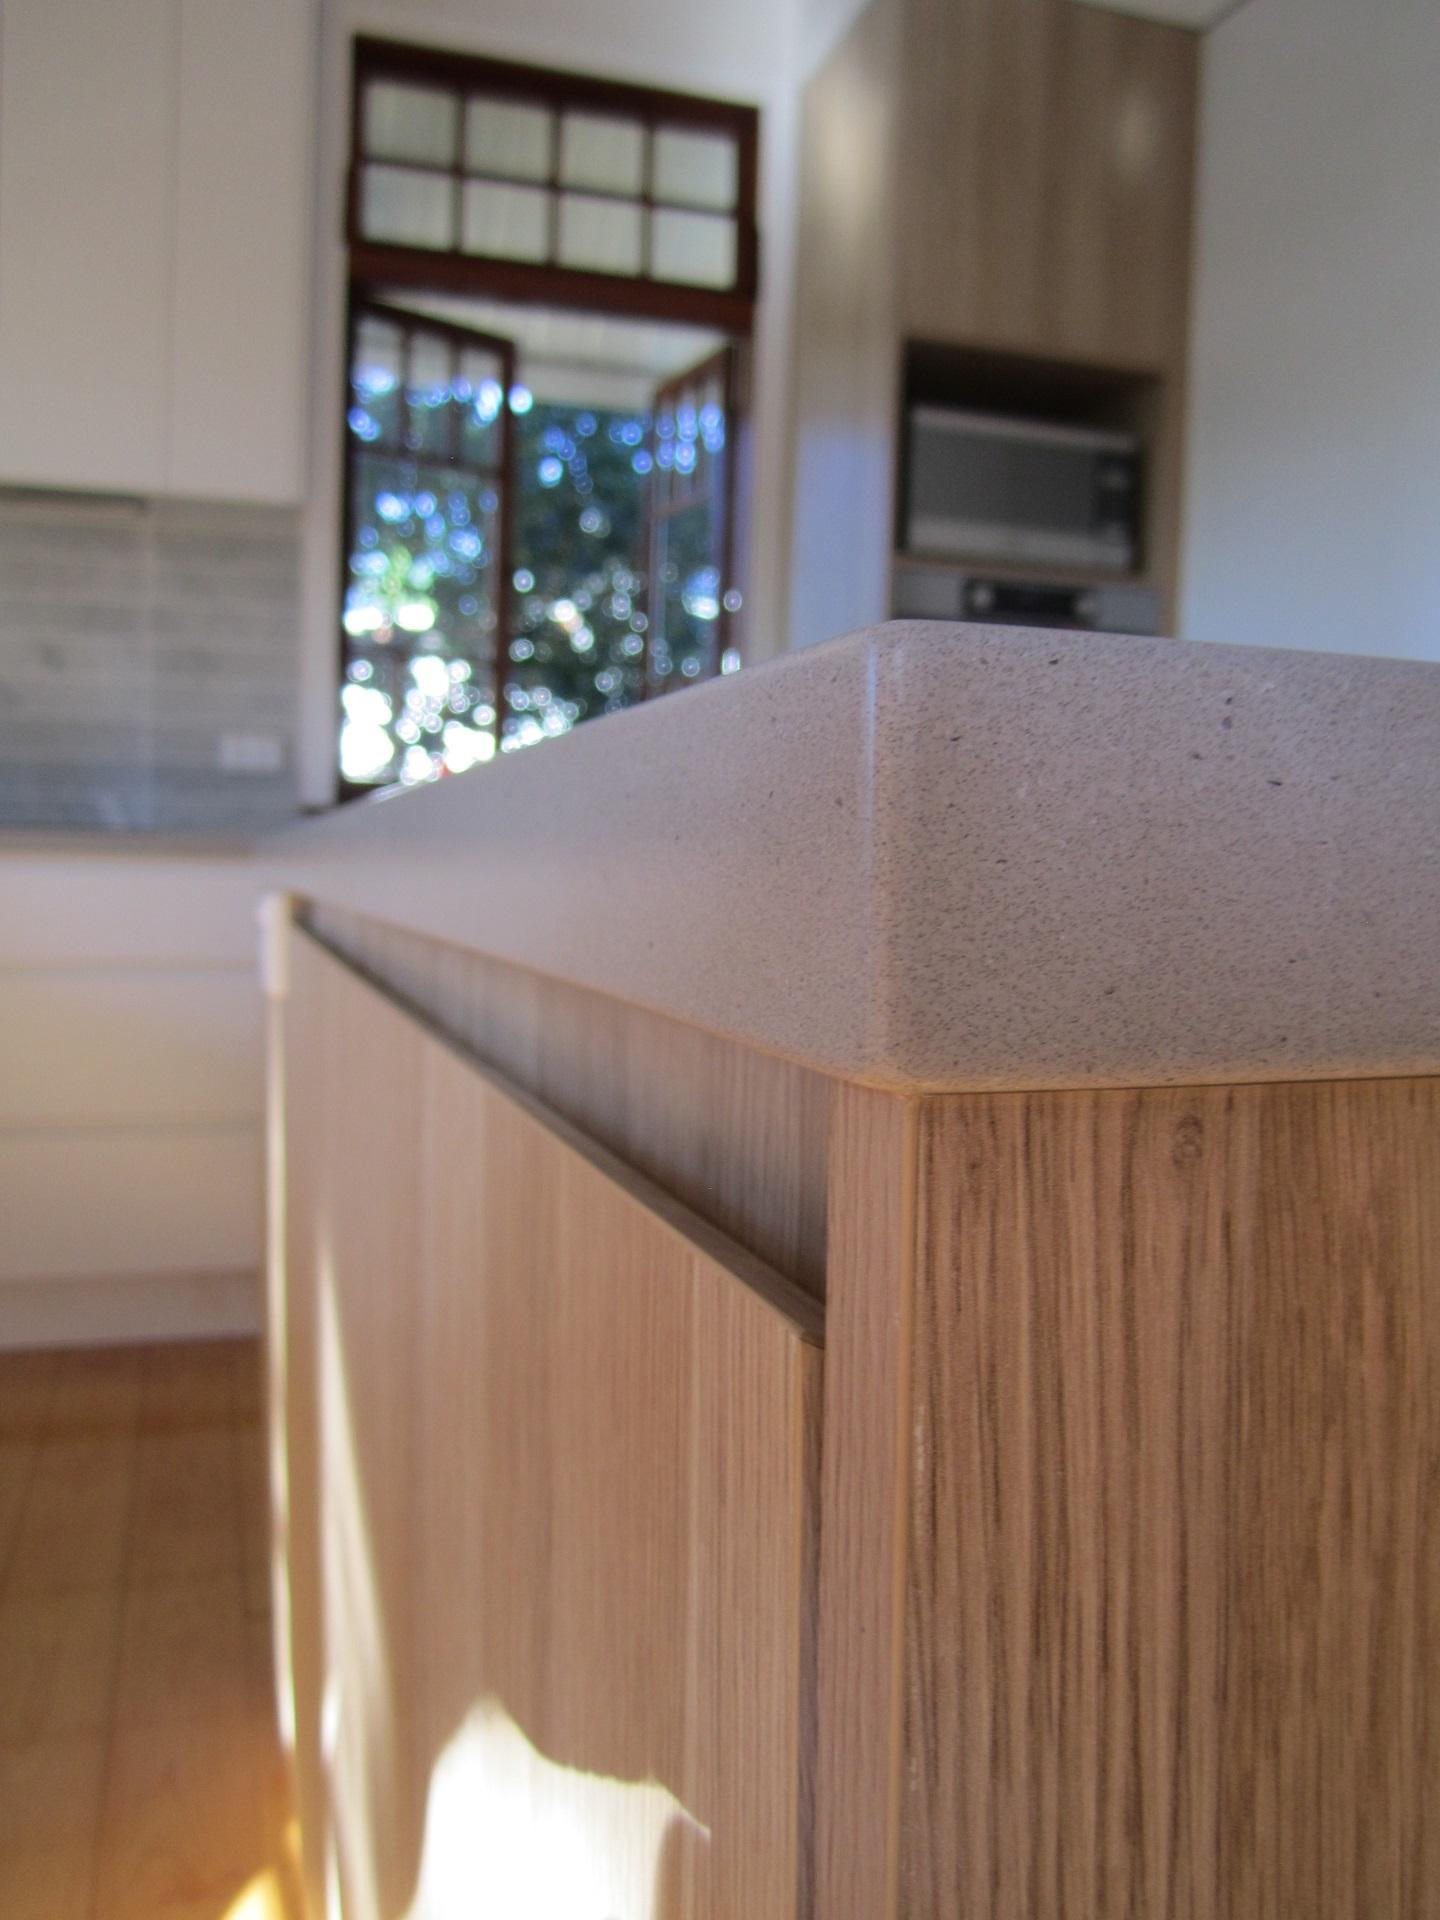 Brisbane Kitchen Design Sherwood Contemporary Kitchen Integrated Handle with Reverse Bevel Edge 10